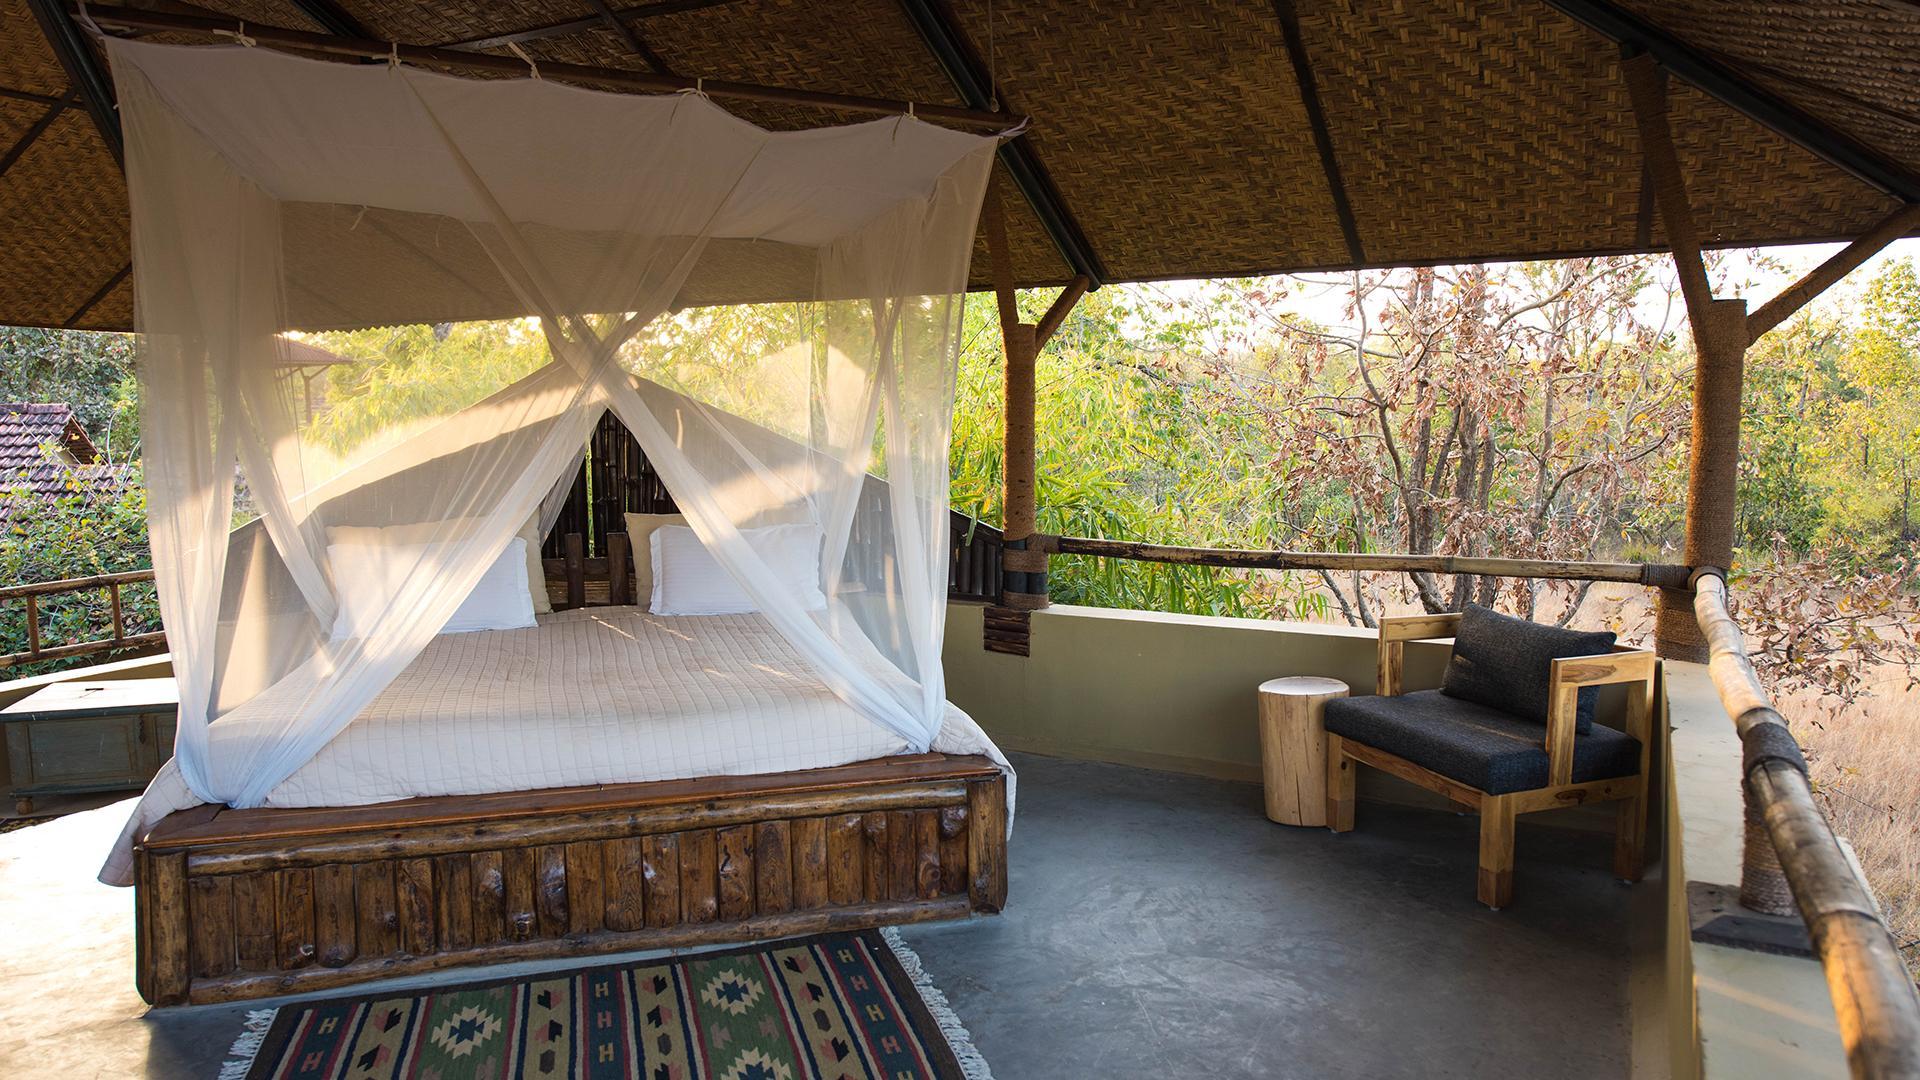 AC Machan Cottage Room image 1 at Forsyth Lodge by Hoshangabad, Madhya Pradesh, India